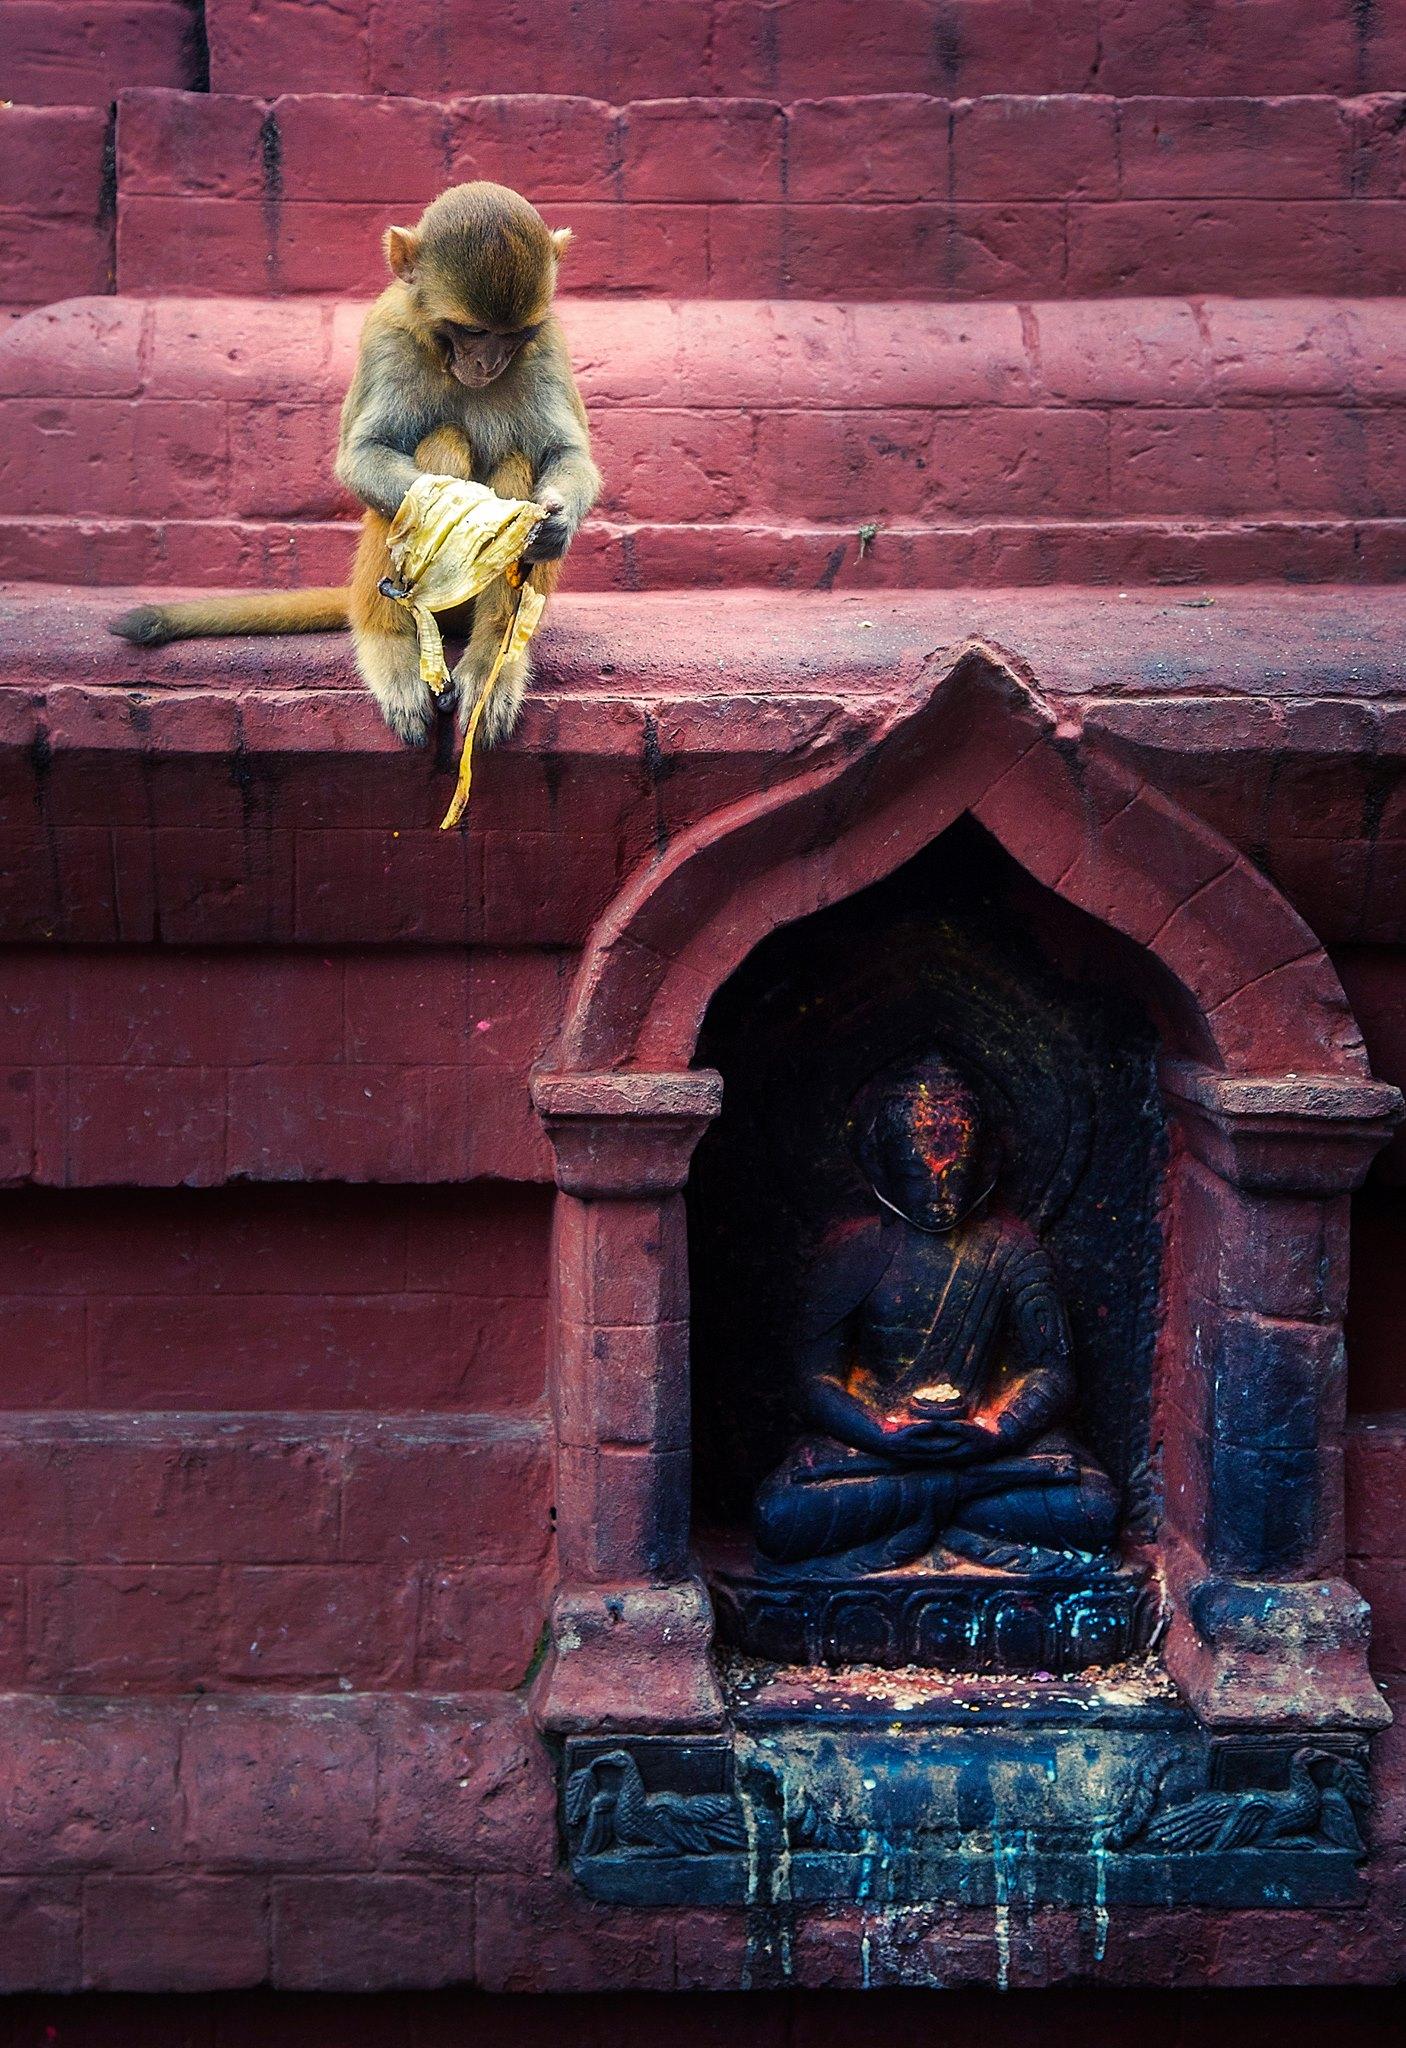 Simon+Needham+Humanitarian+Photography+Nepal+11.jpg